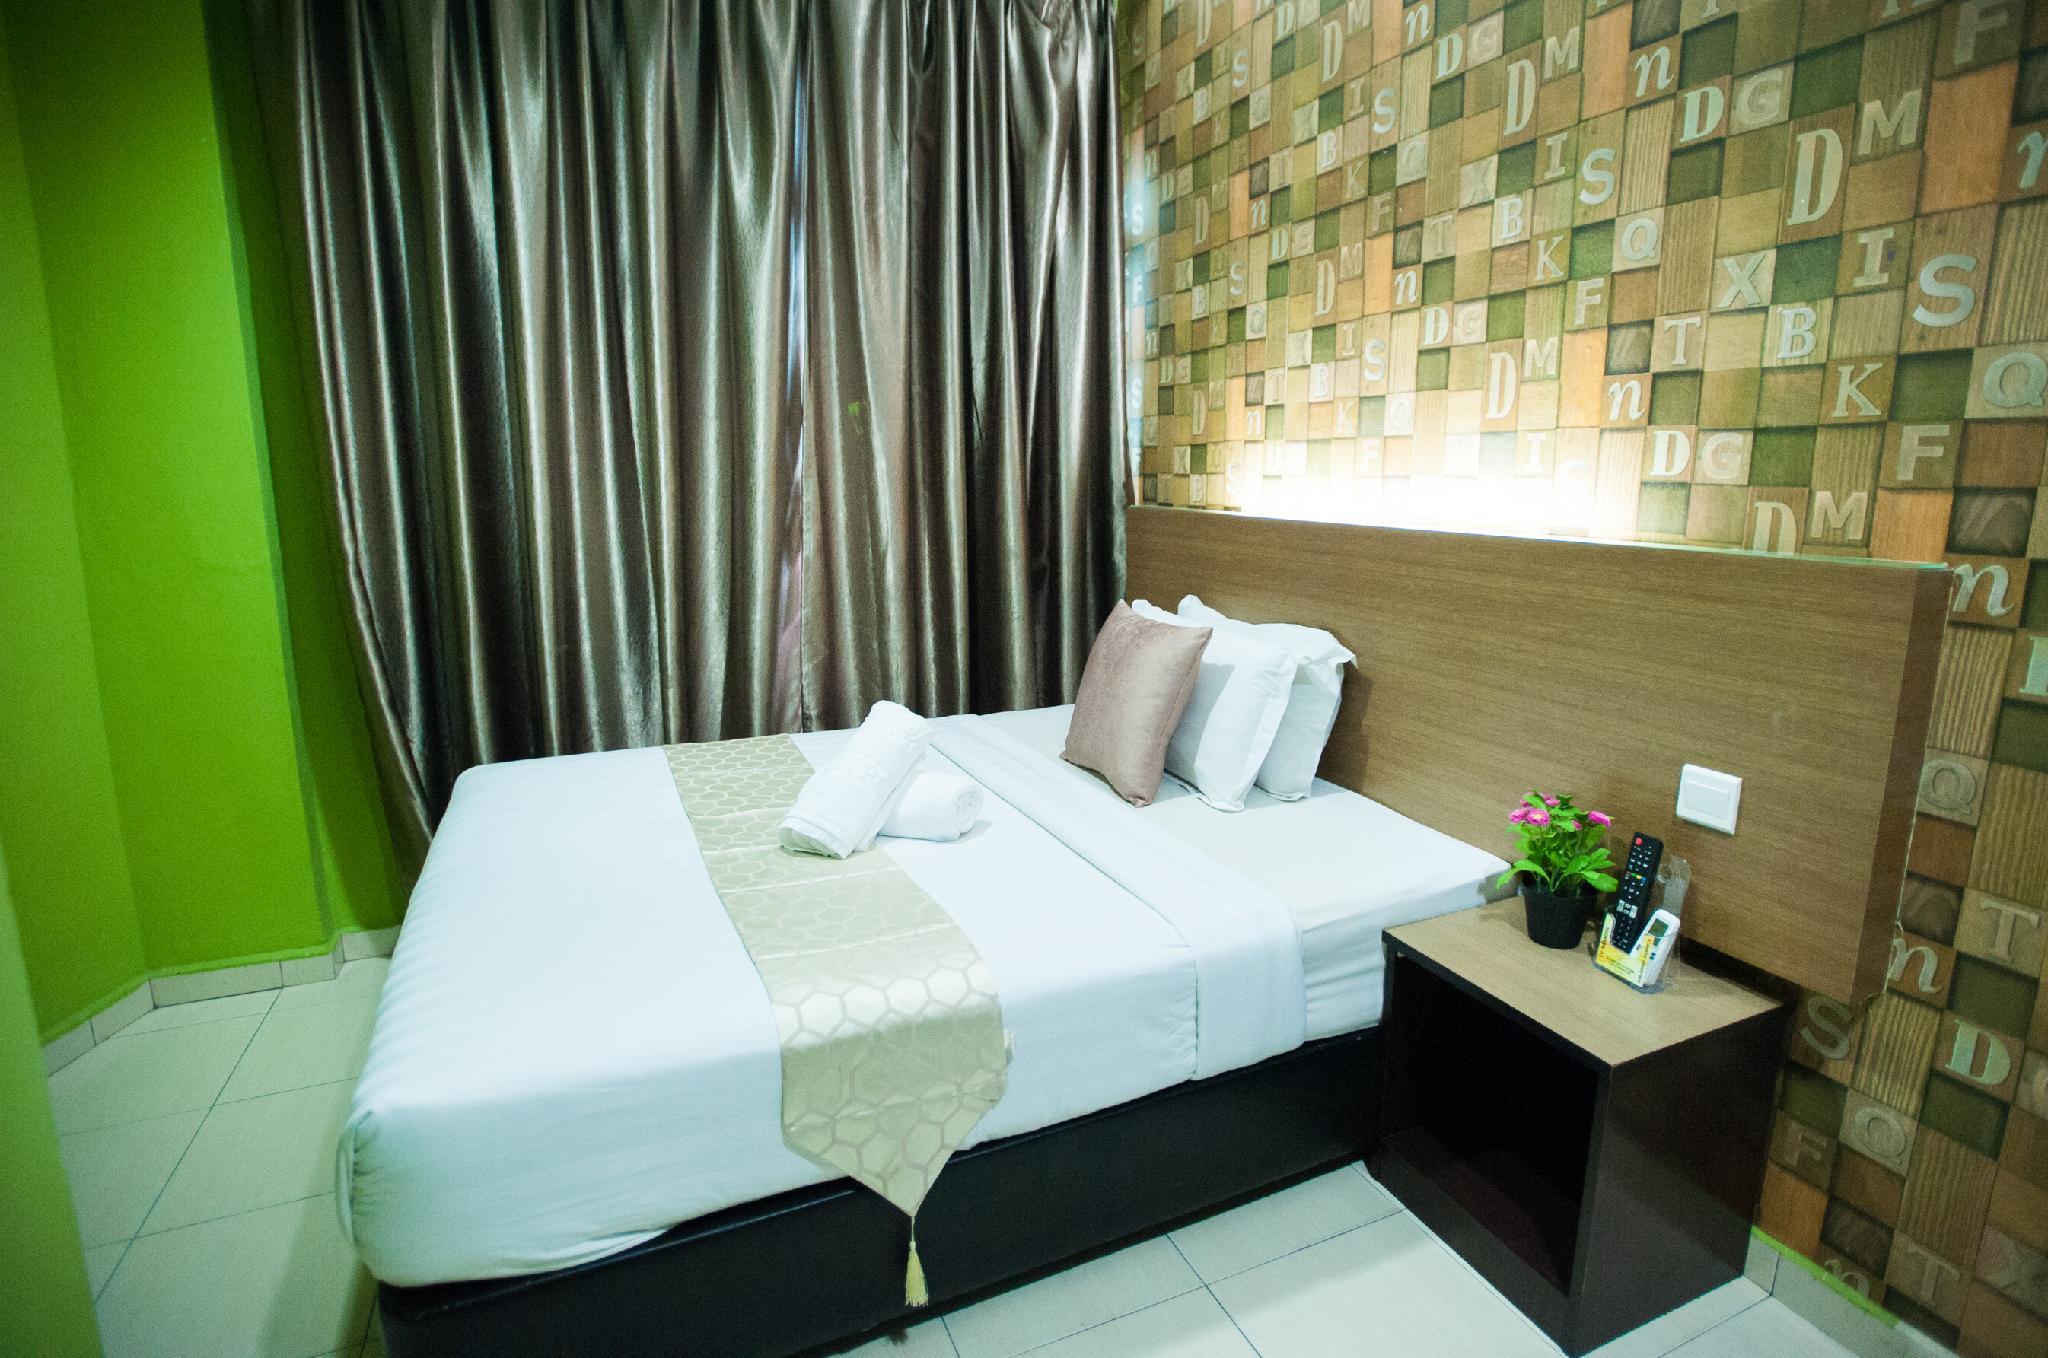 DJ Citi Point Hotel, Kuala Terengganu